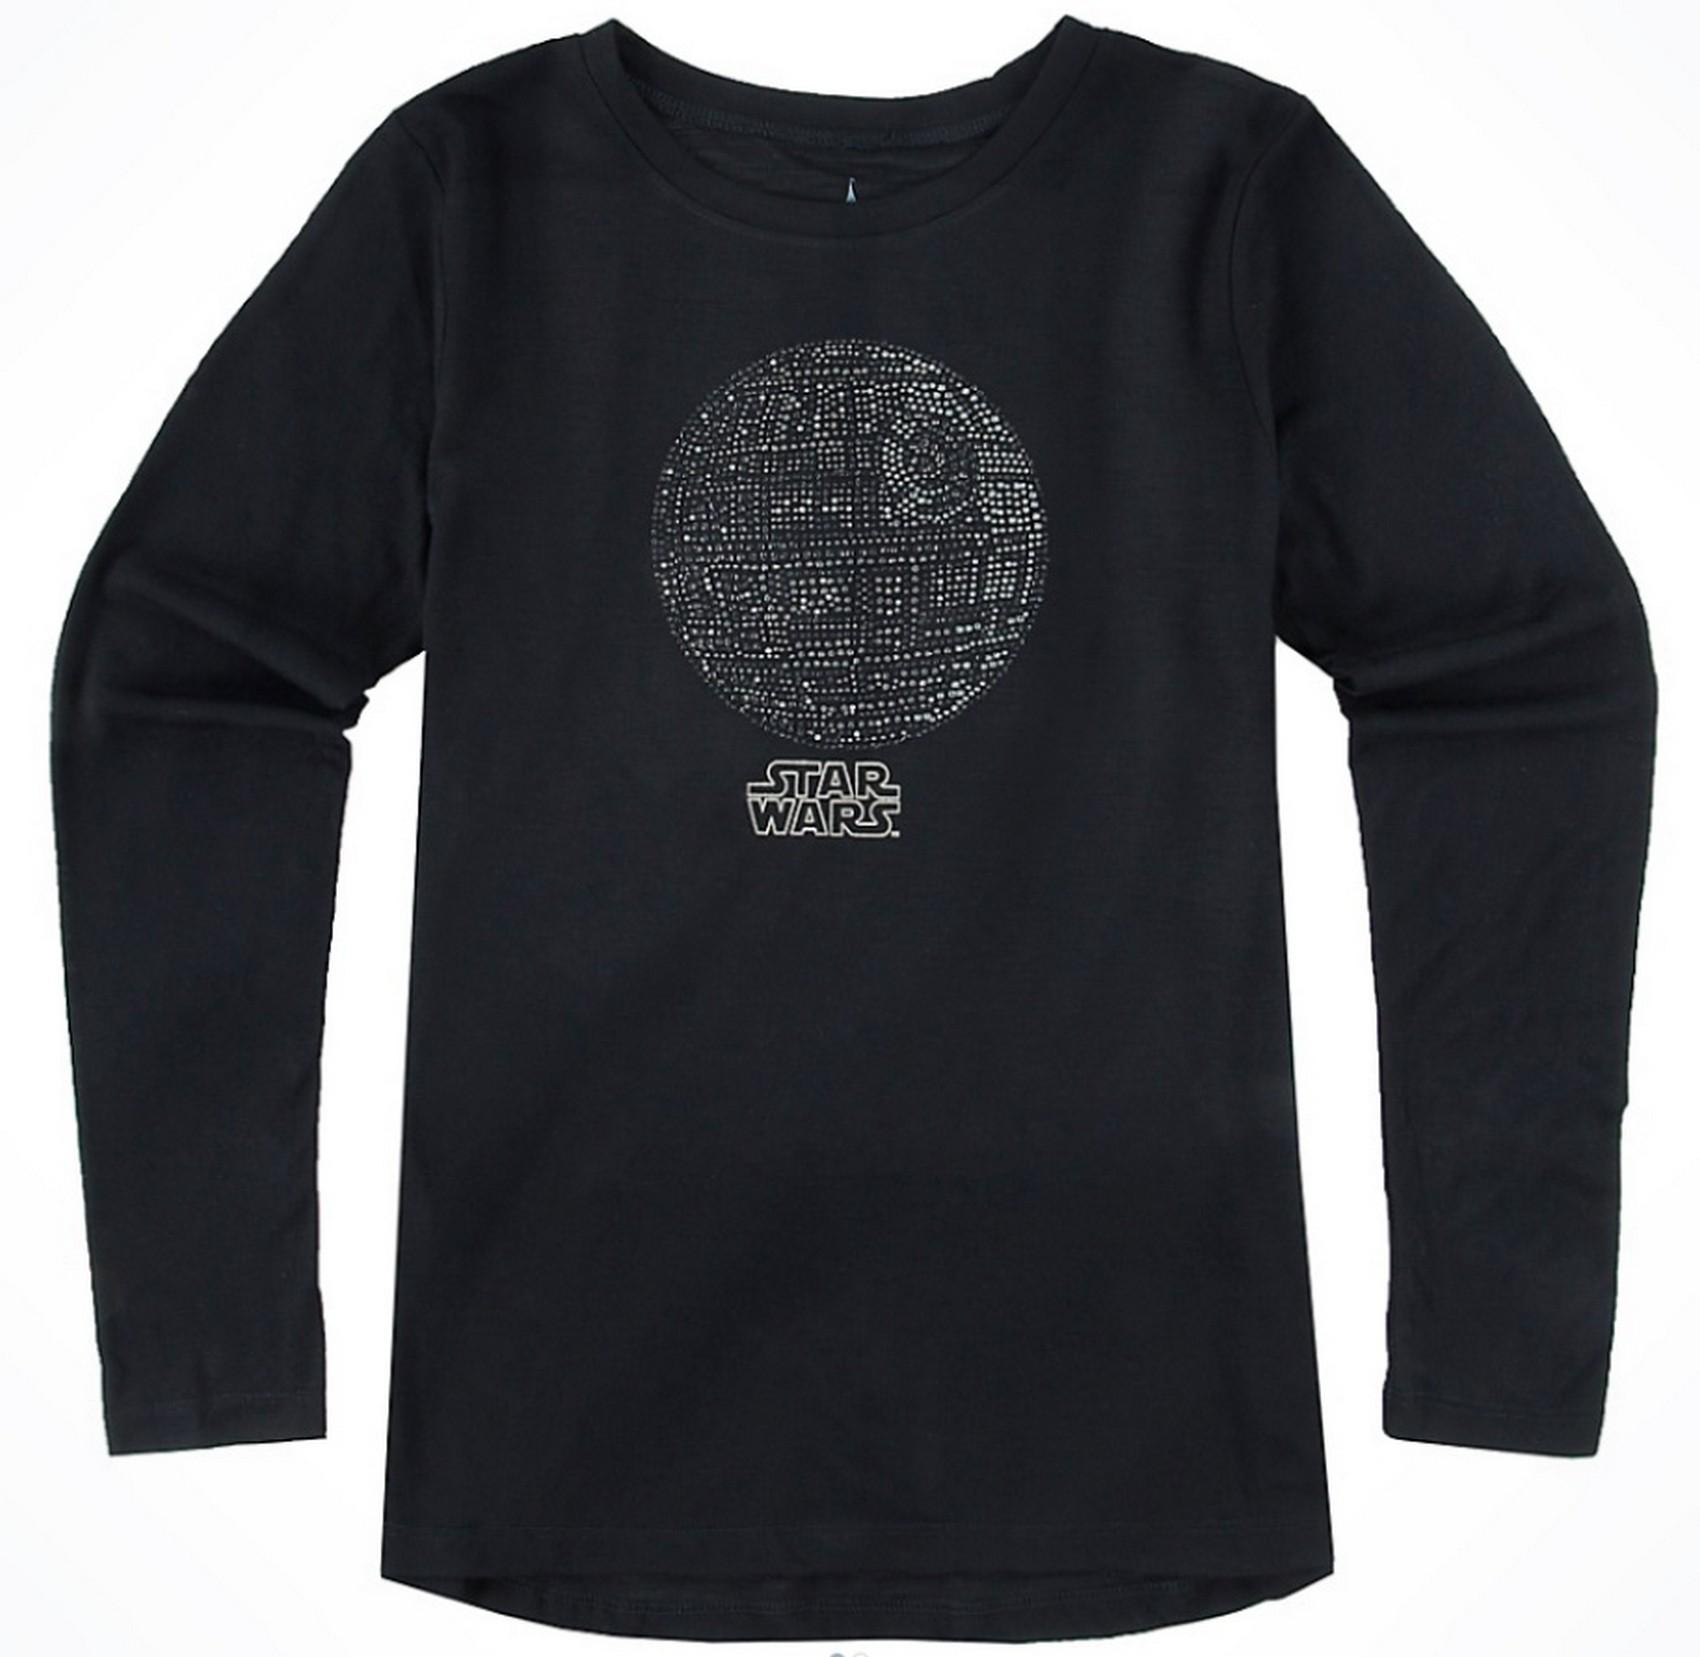 Rhinestone Death Star Long Sleeved Adult T-Shirt (Tshirt, T shirt or Tee) - Disney's Star Wars © Dizdude.com